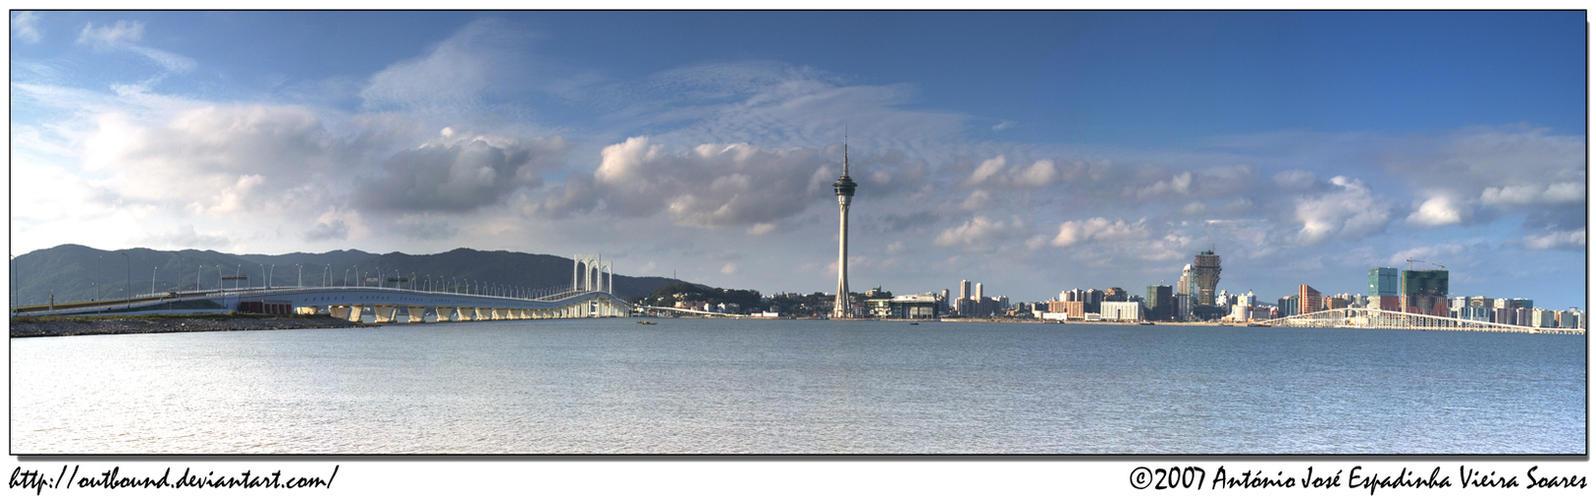 Macau... by Outbound